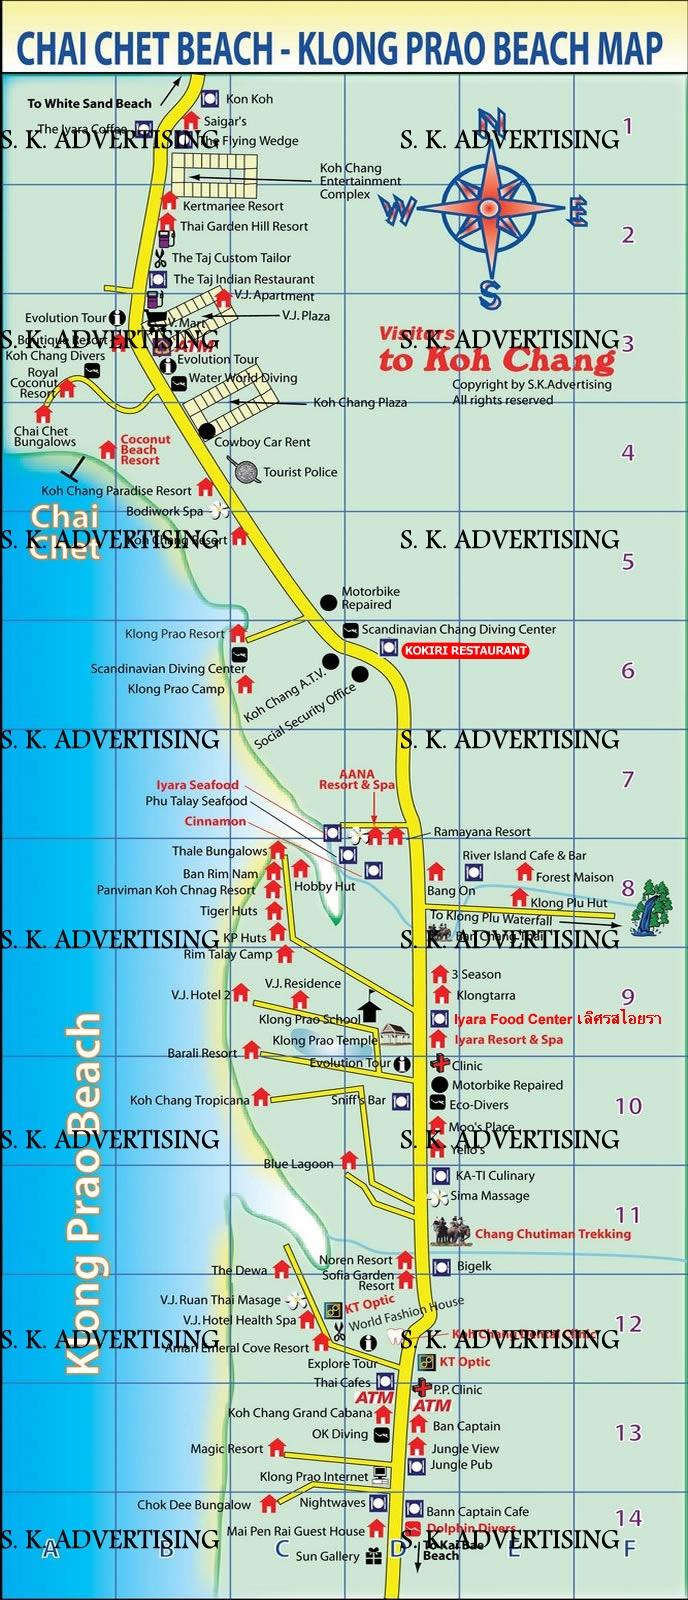 Chai Chet & Klong Prao Beach